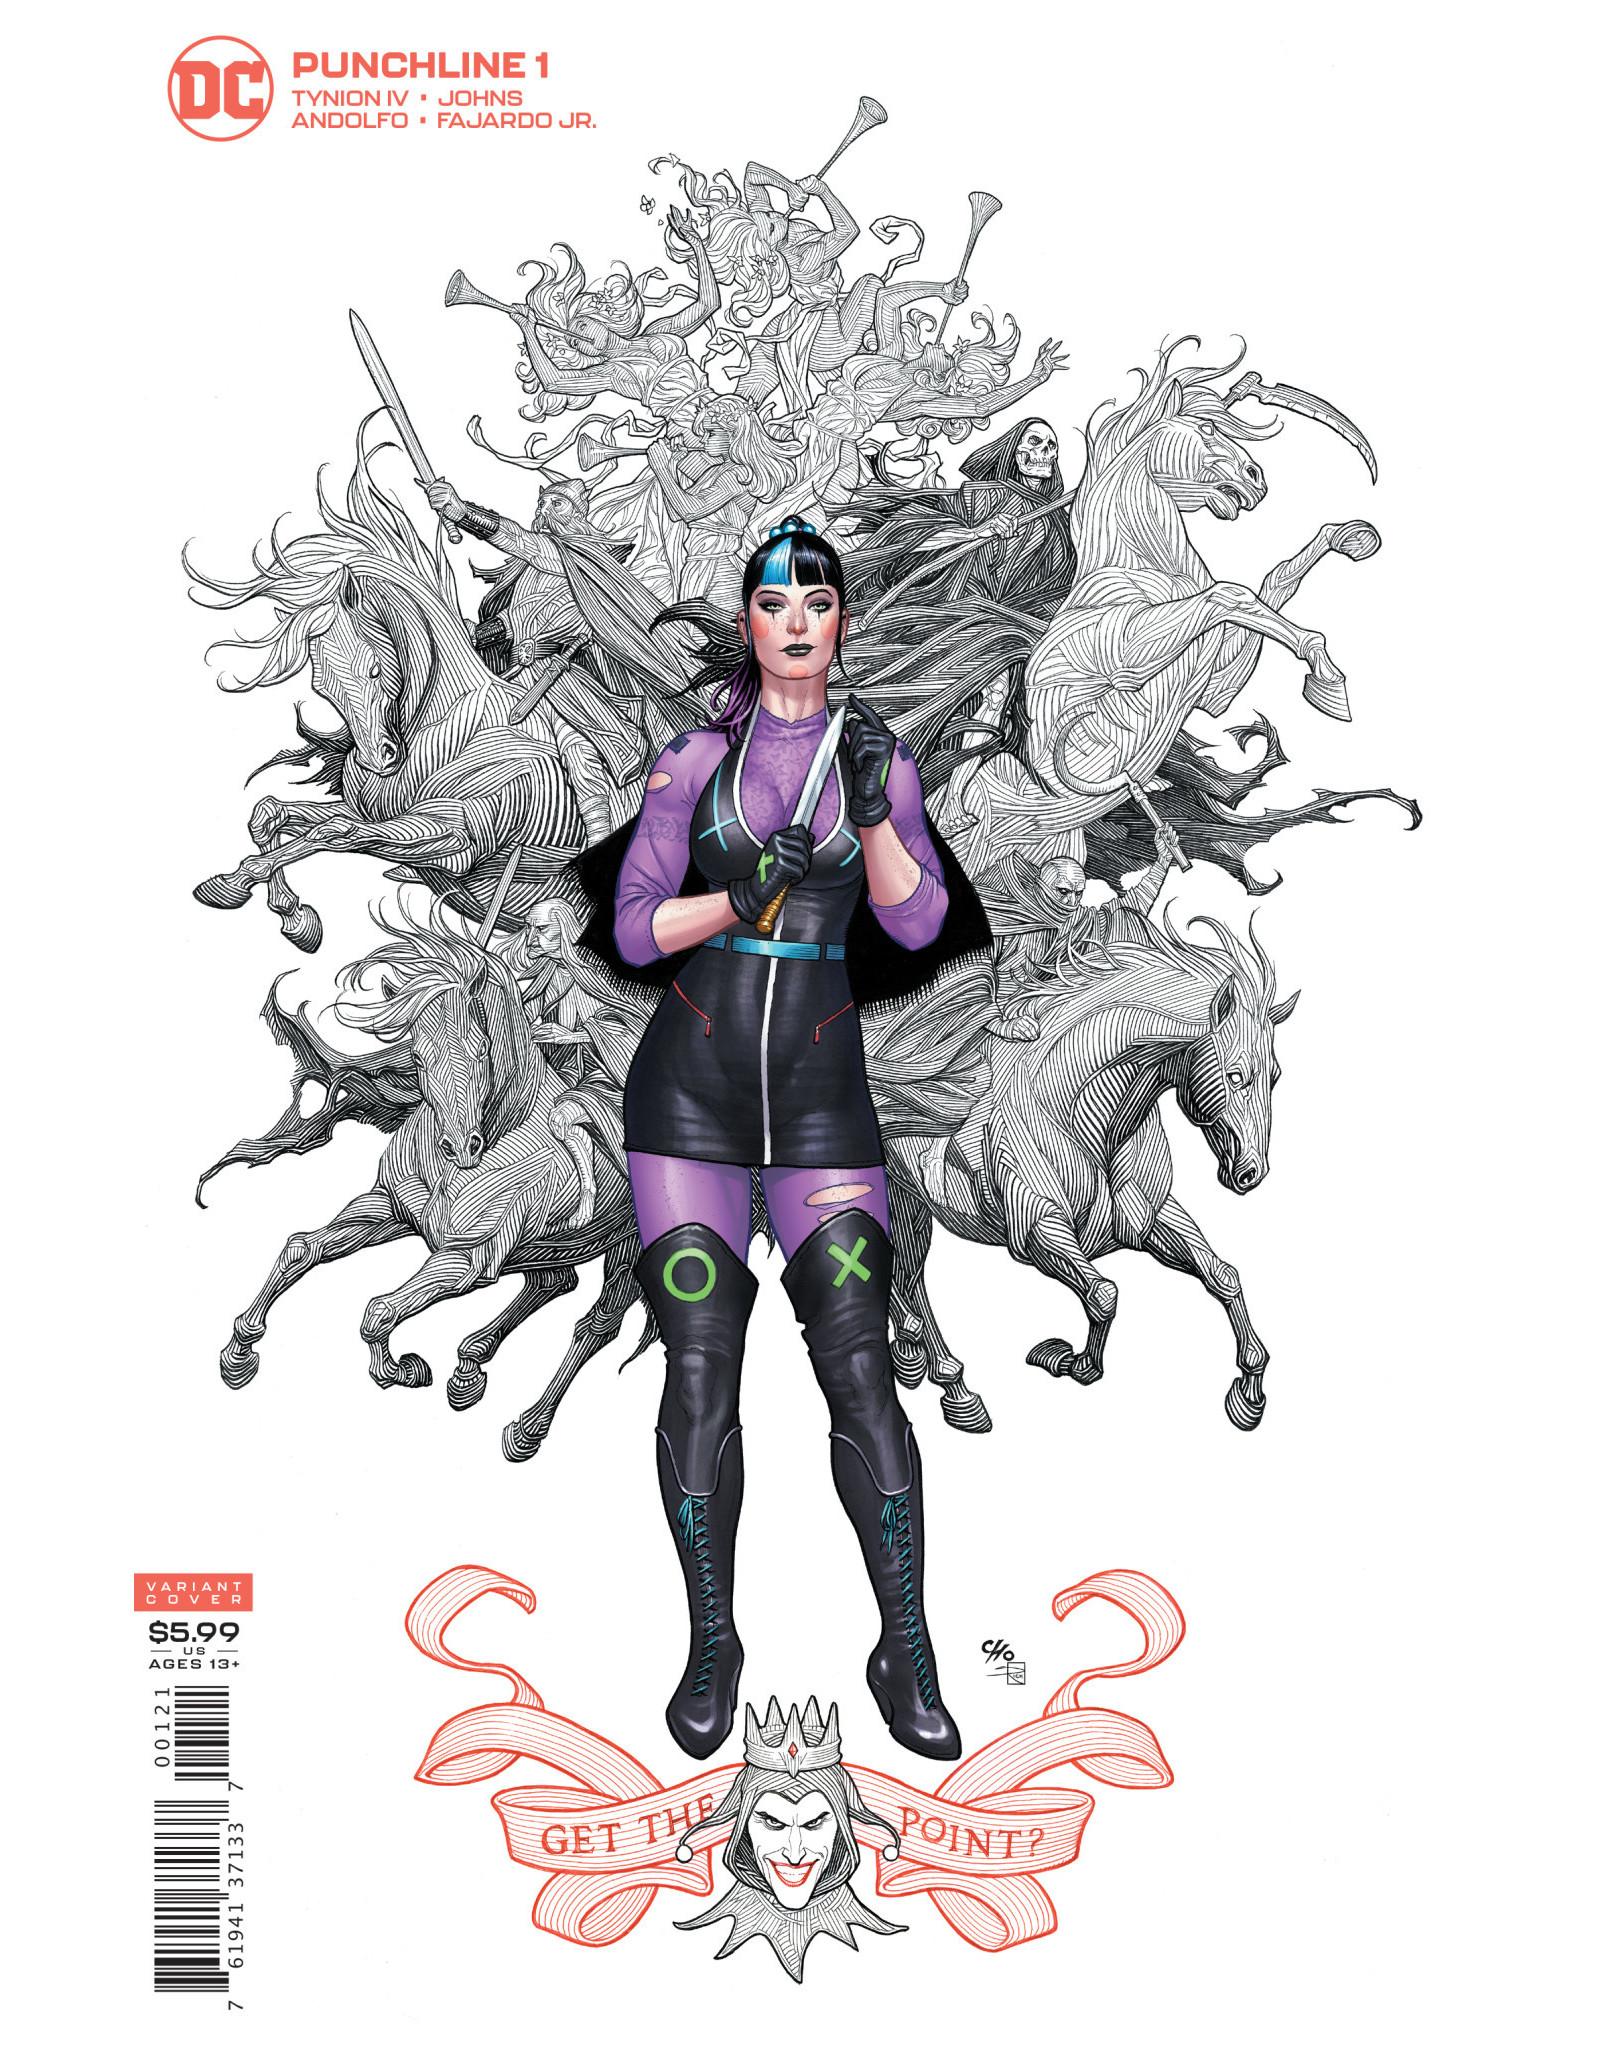 DC Comics PUNCHLINE SPECIAL #1 (ONE SHOT) CVR B FRANK CHO CARD STOCK VAR